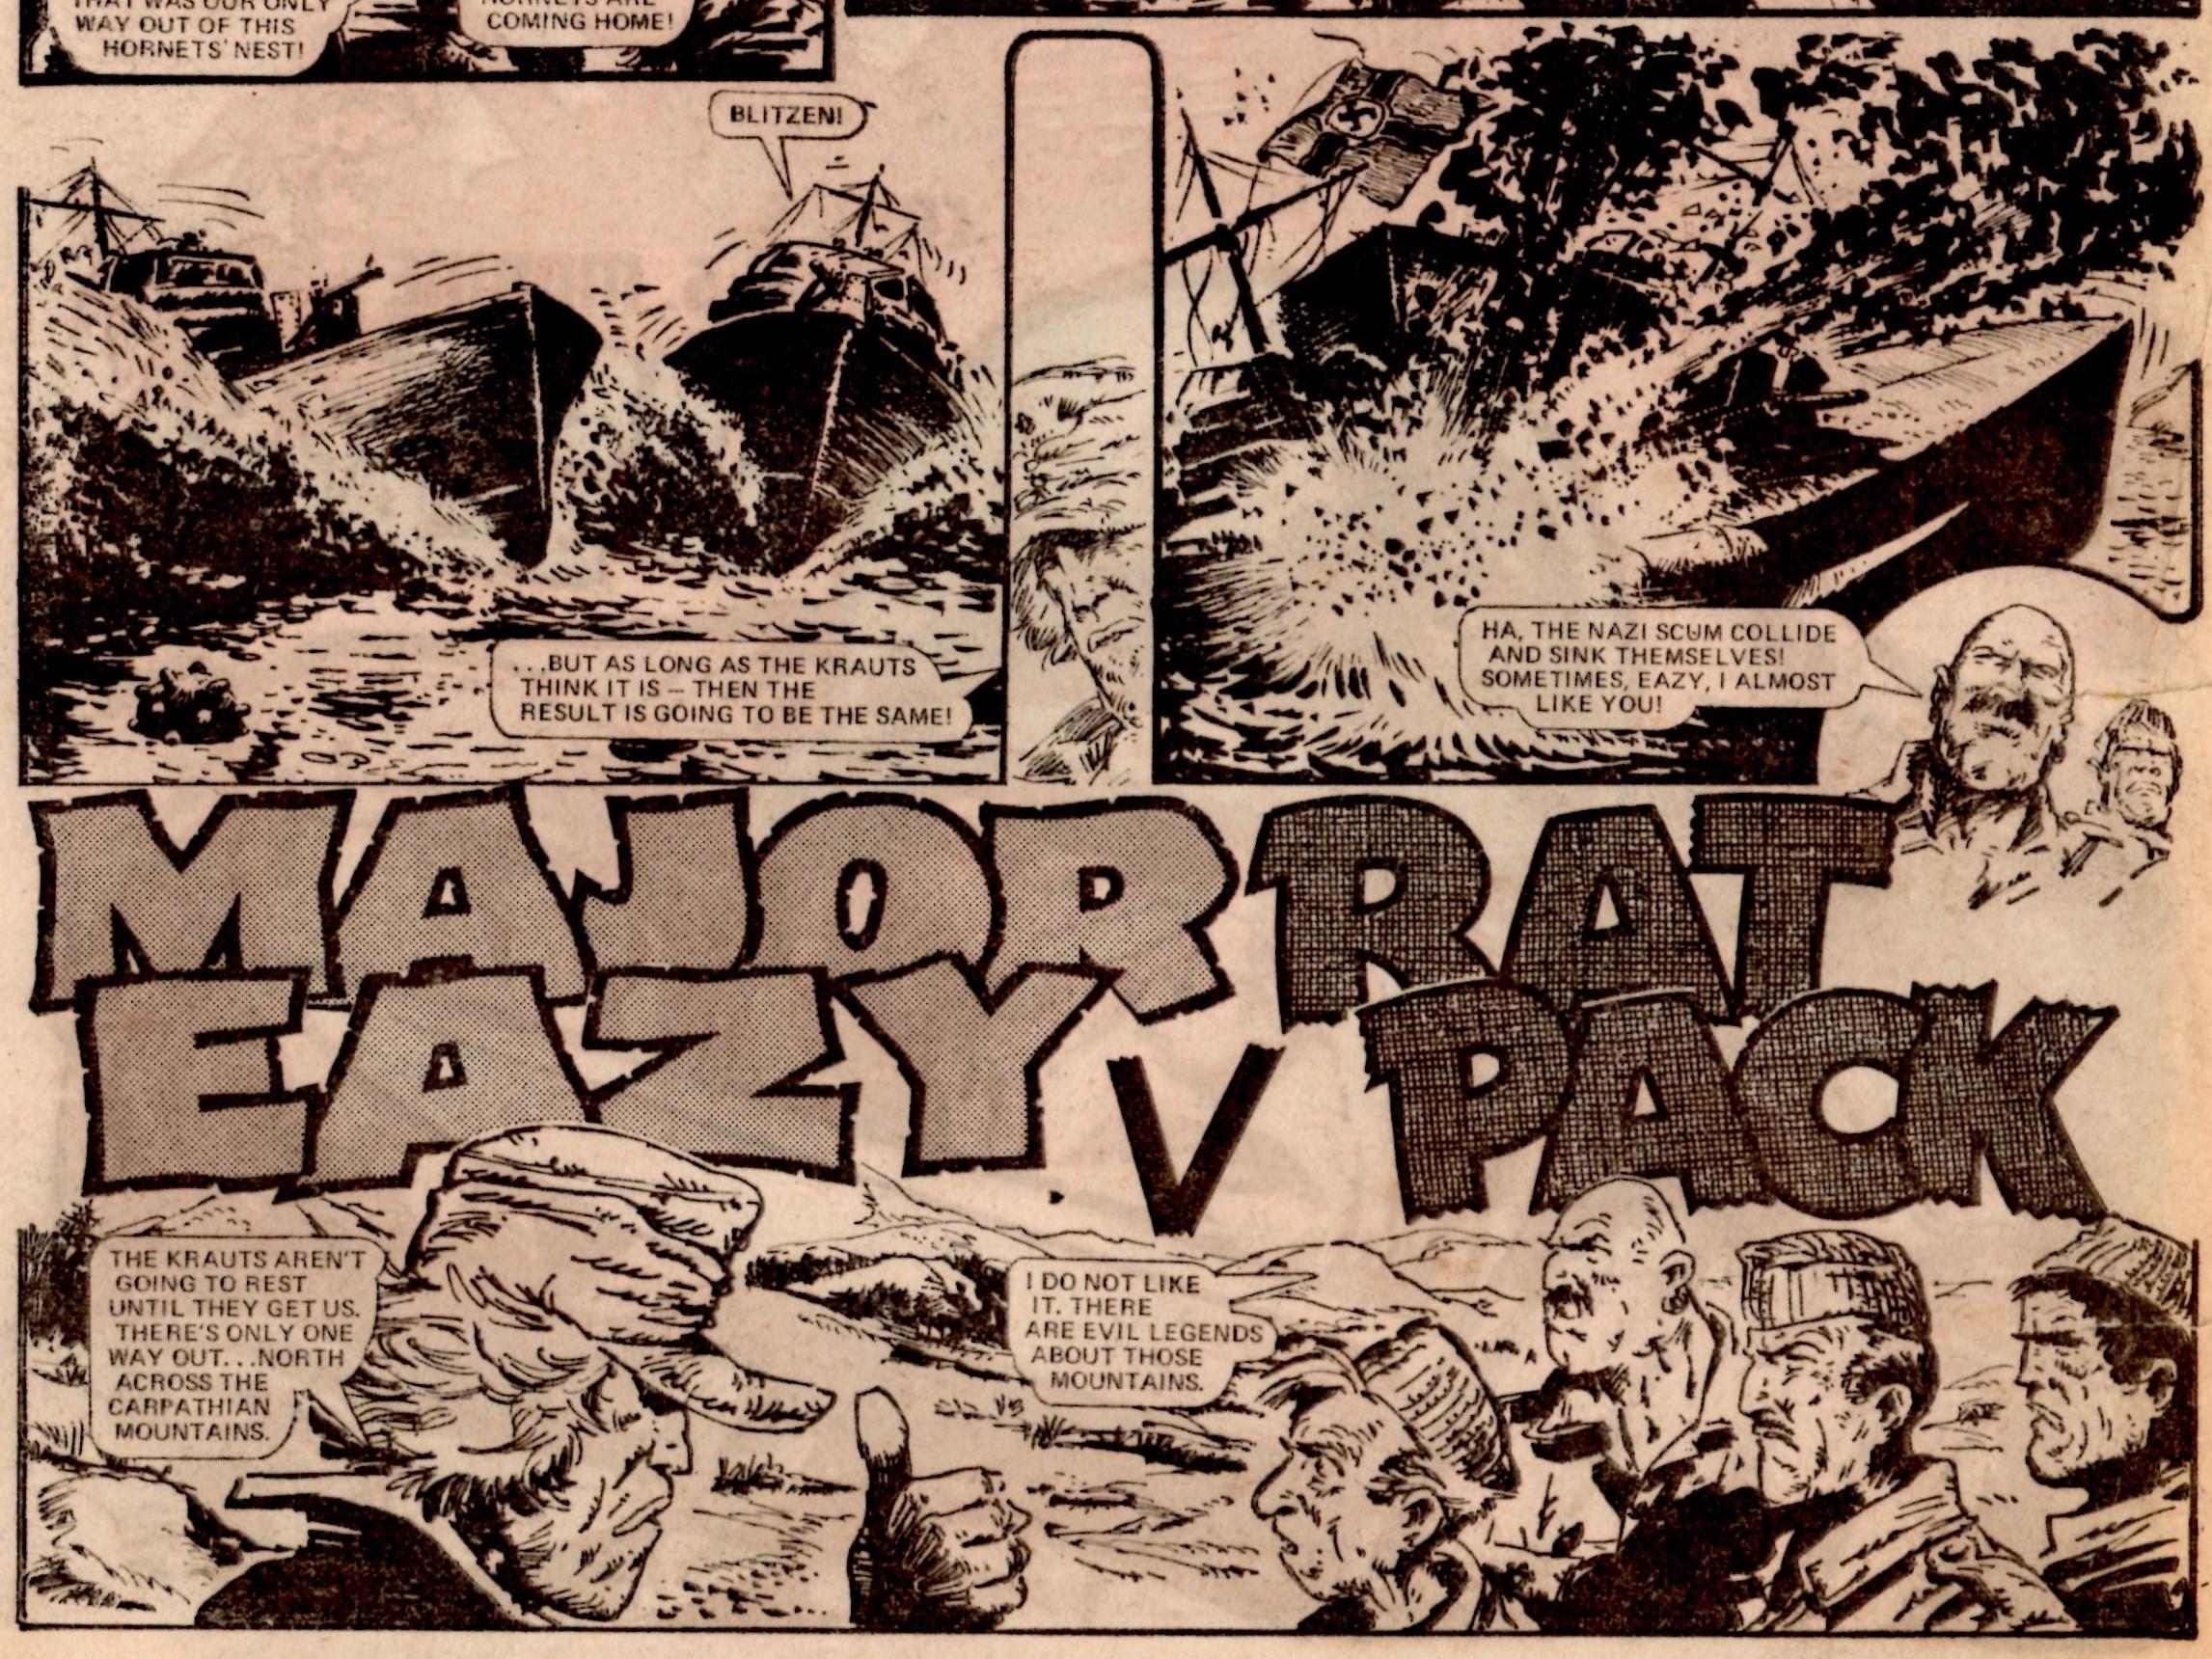 Major Eazy v Rat Pack: Alan Hebden (writer), Carlos Ezquerra (artist)